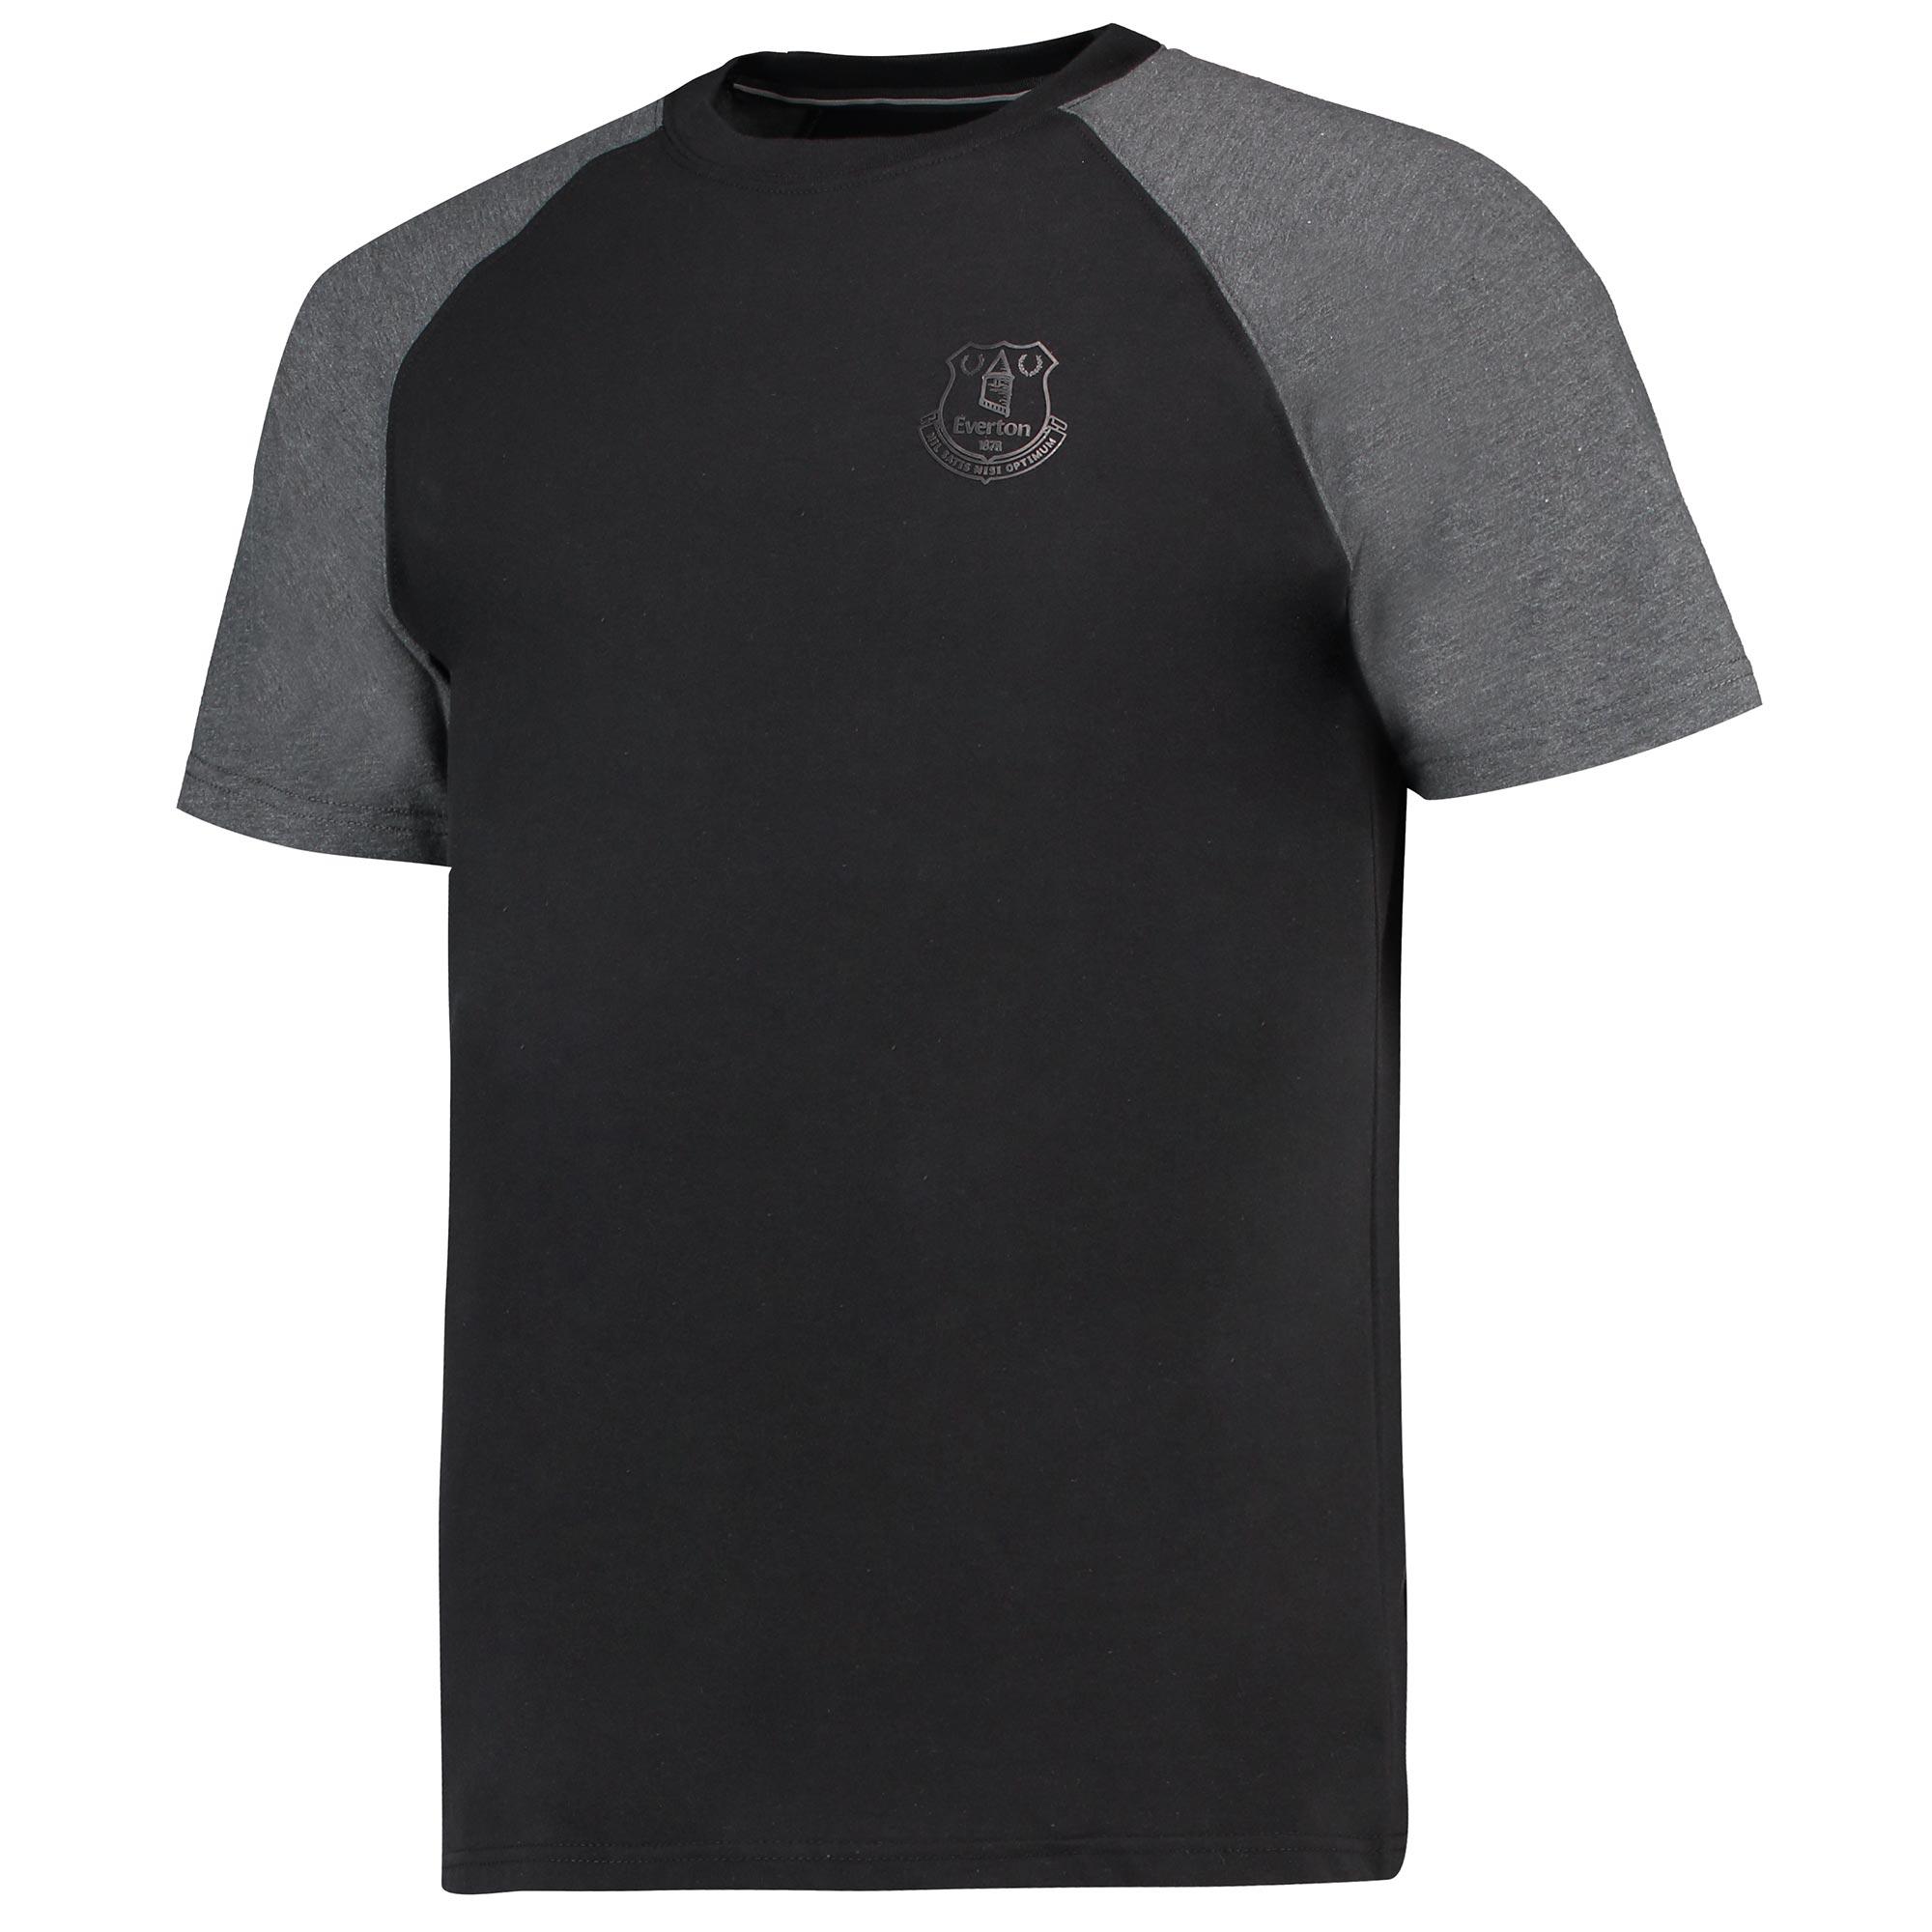 Image of Everton Ath T-Shirt - Black/Charcoal Marl